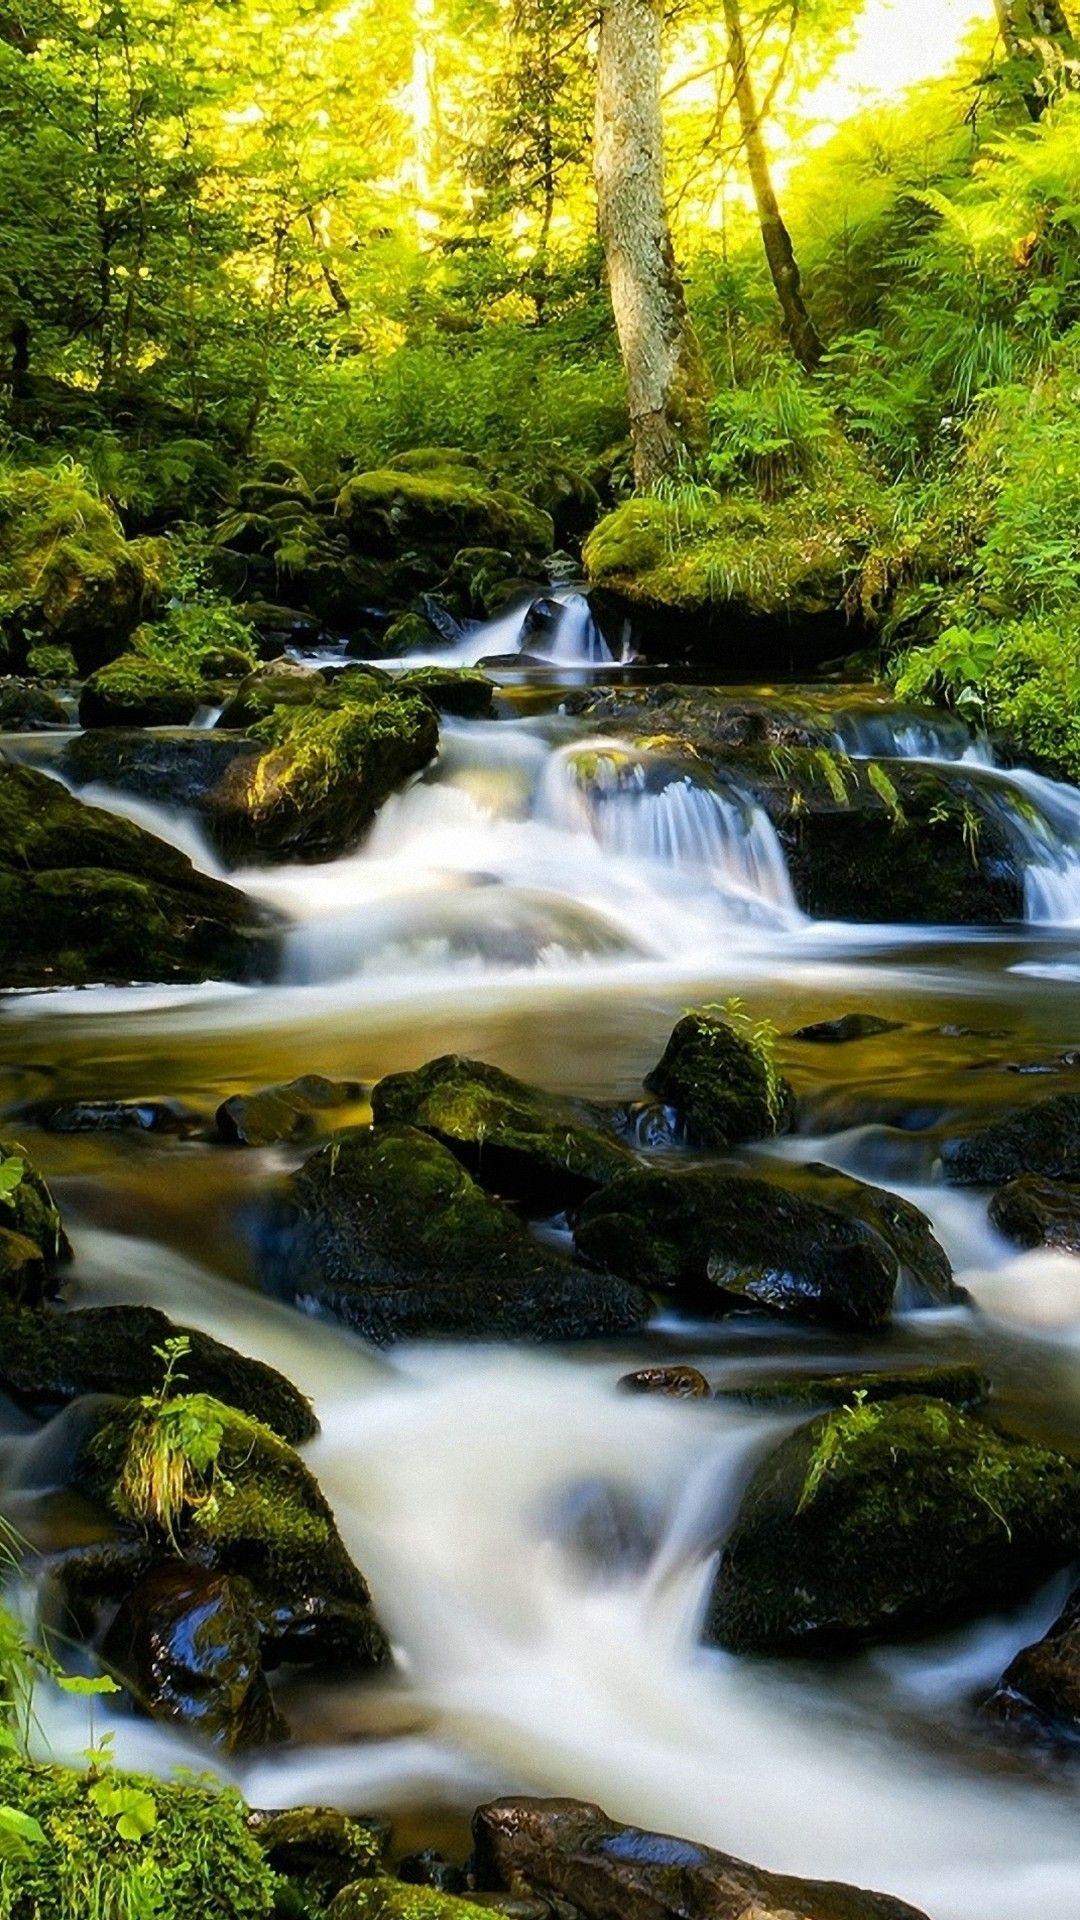 Green Nature Nature Iphone Wallpaper 3d